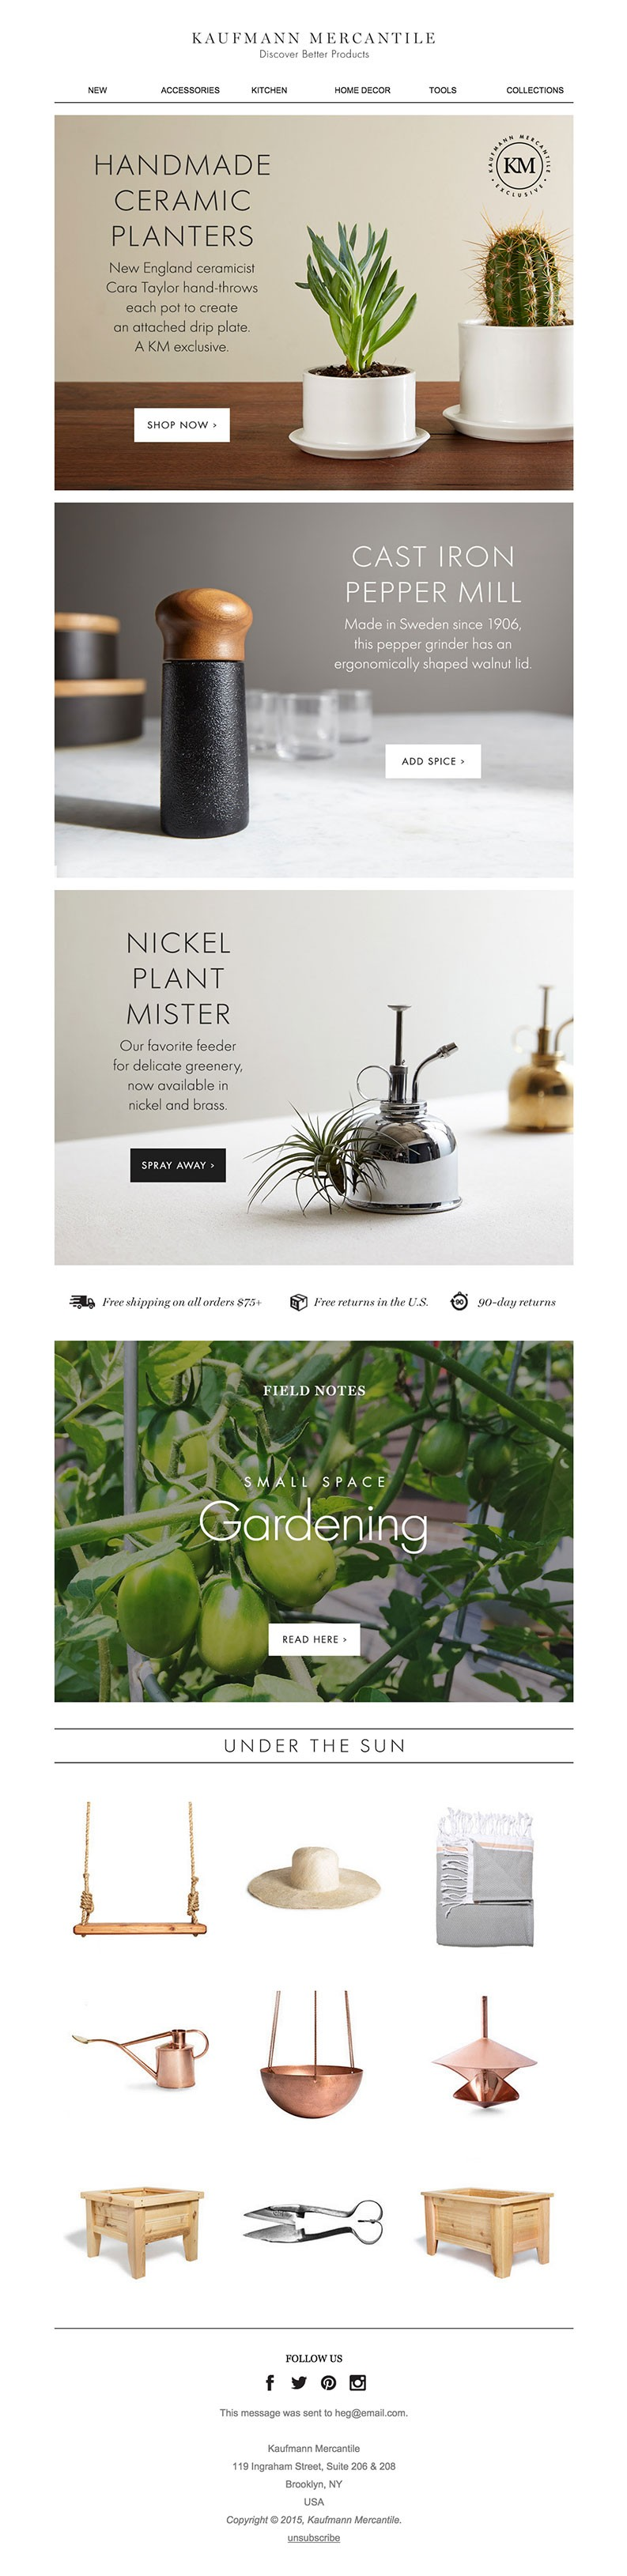 eCommerce email design inspiration